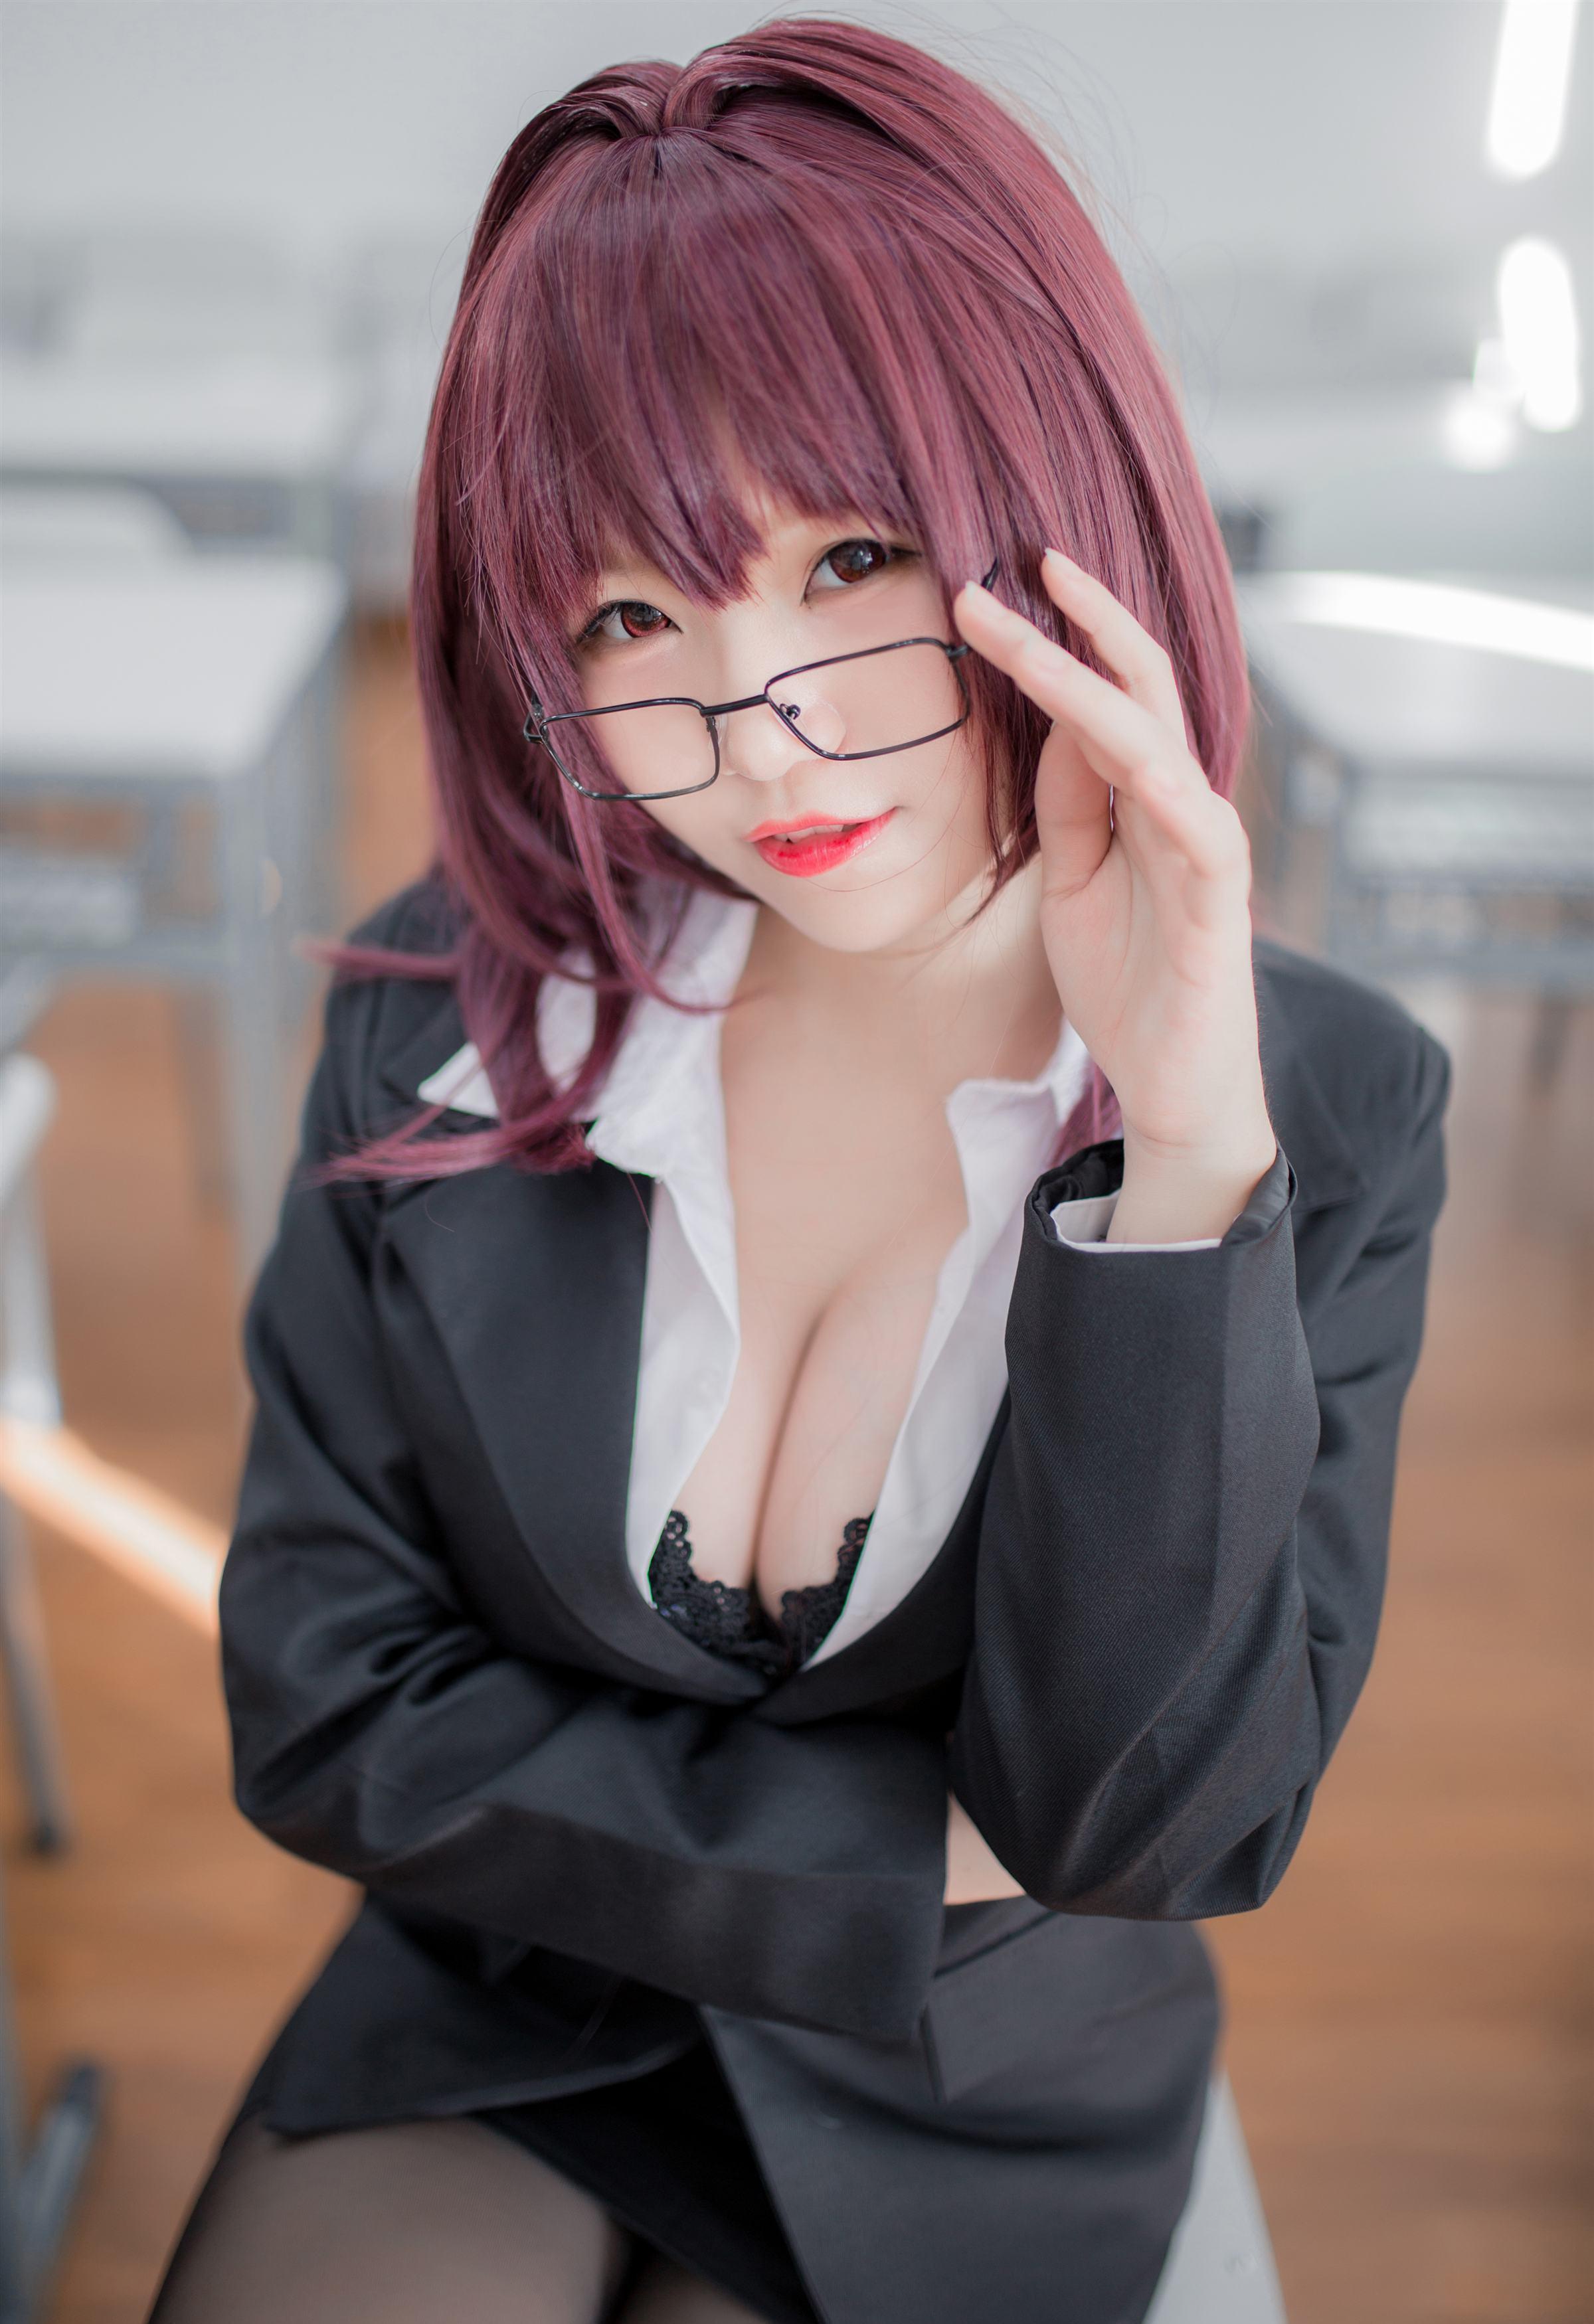 Yoko宅夏 – 斯卡哈教师-EV3A